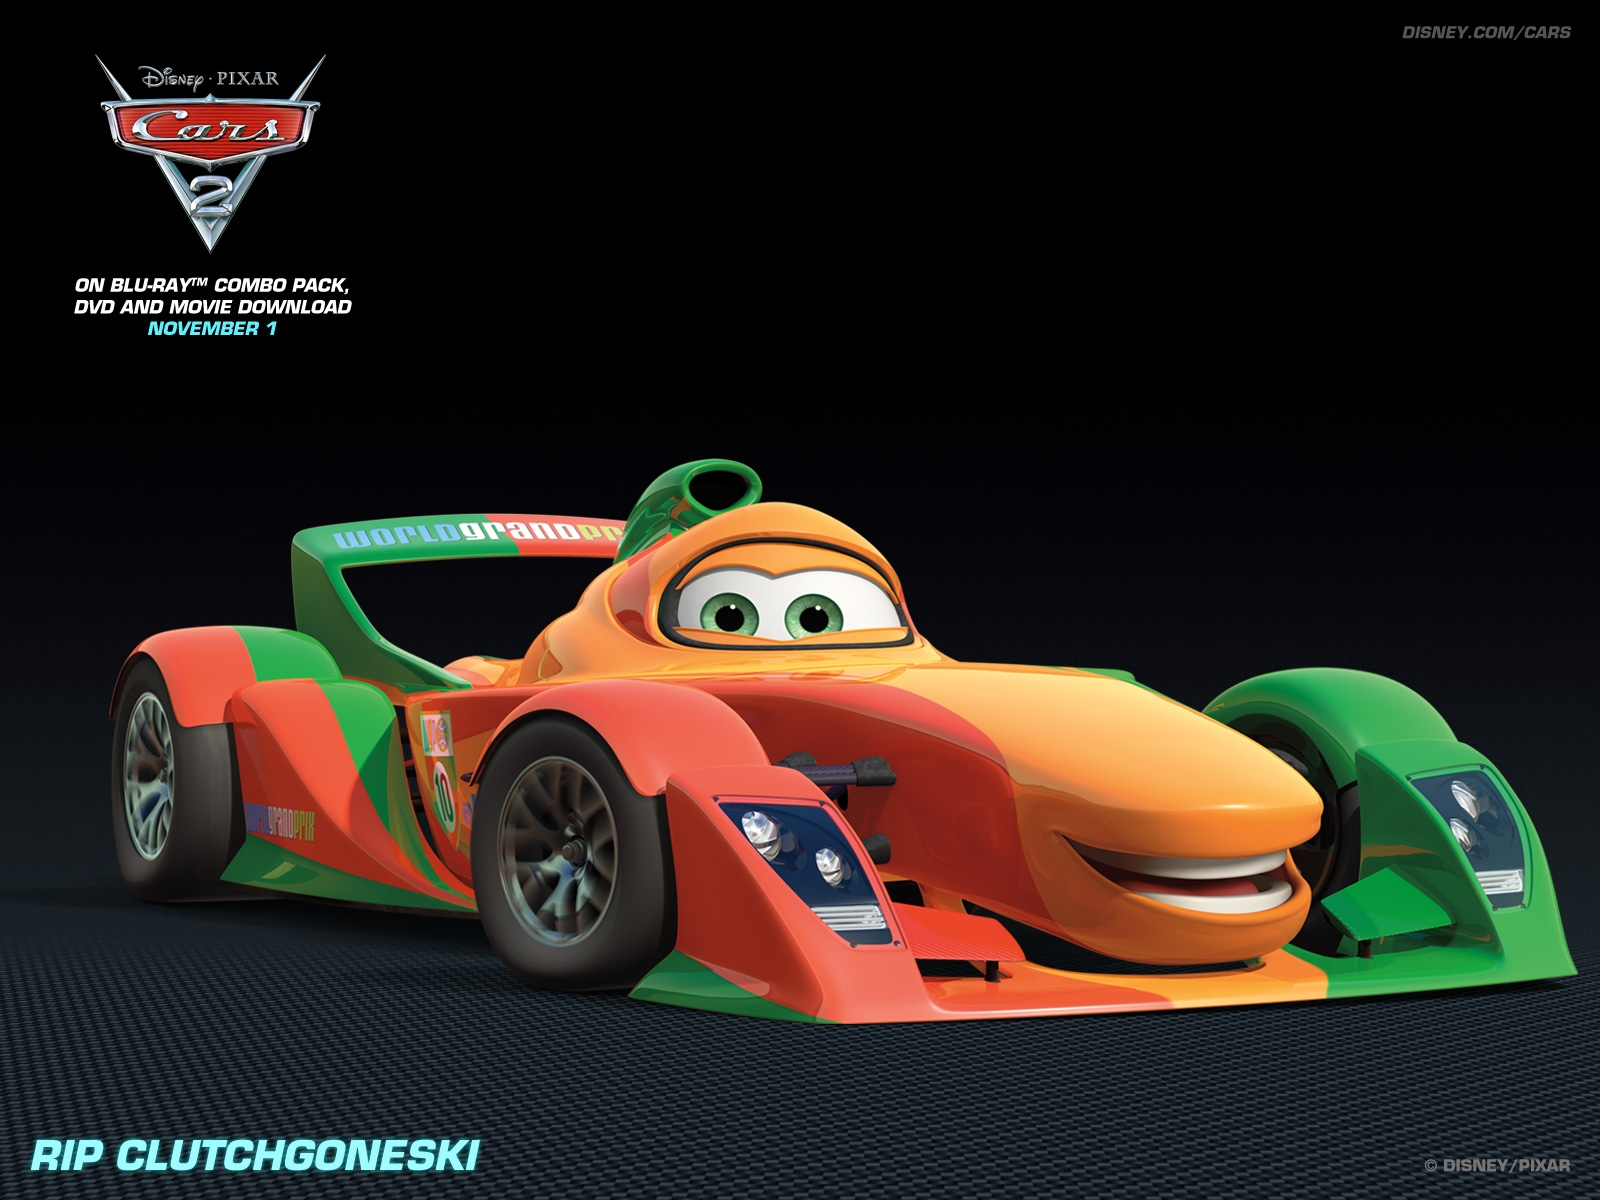 rip clutchgoneski disney pixar cars 2 hd free image